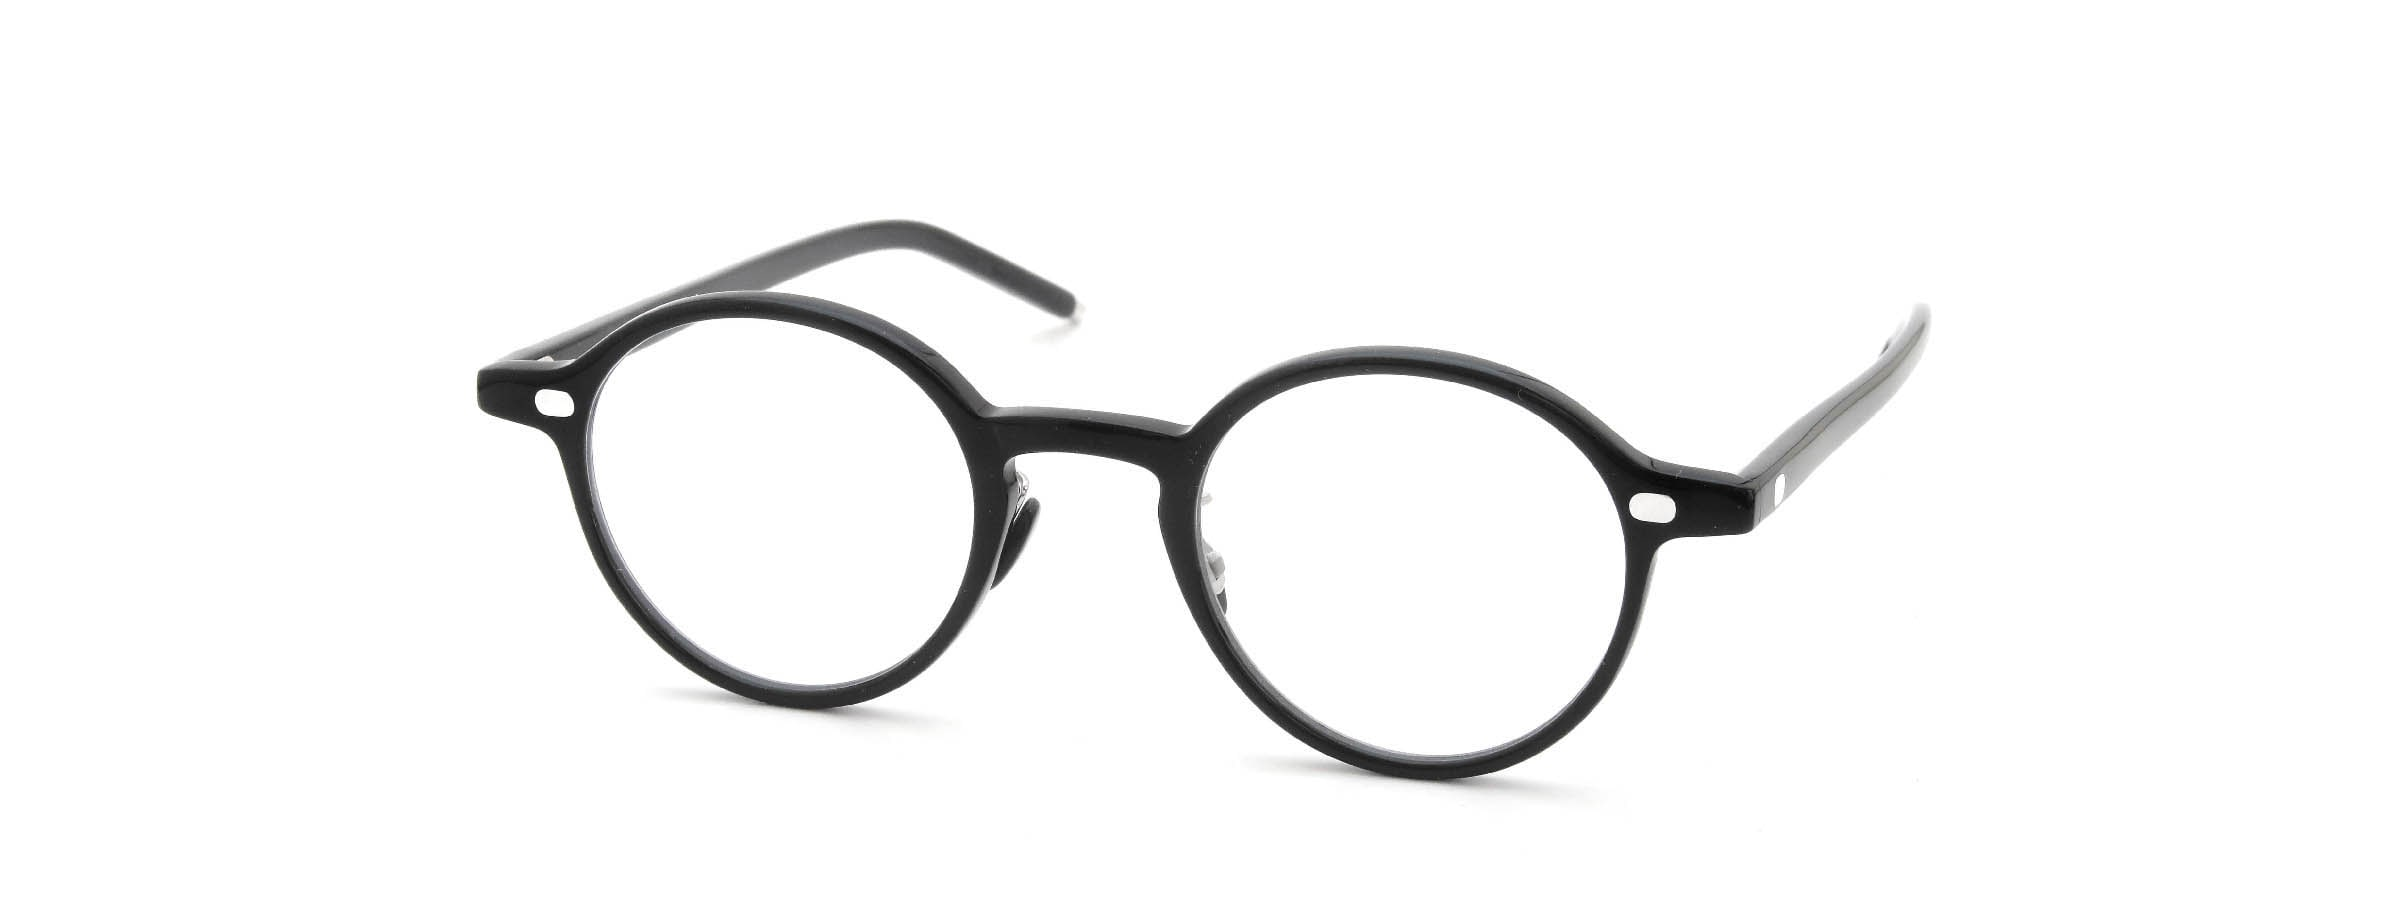 10 eyevan NO.5 Ⅲ 43size